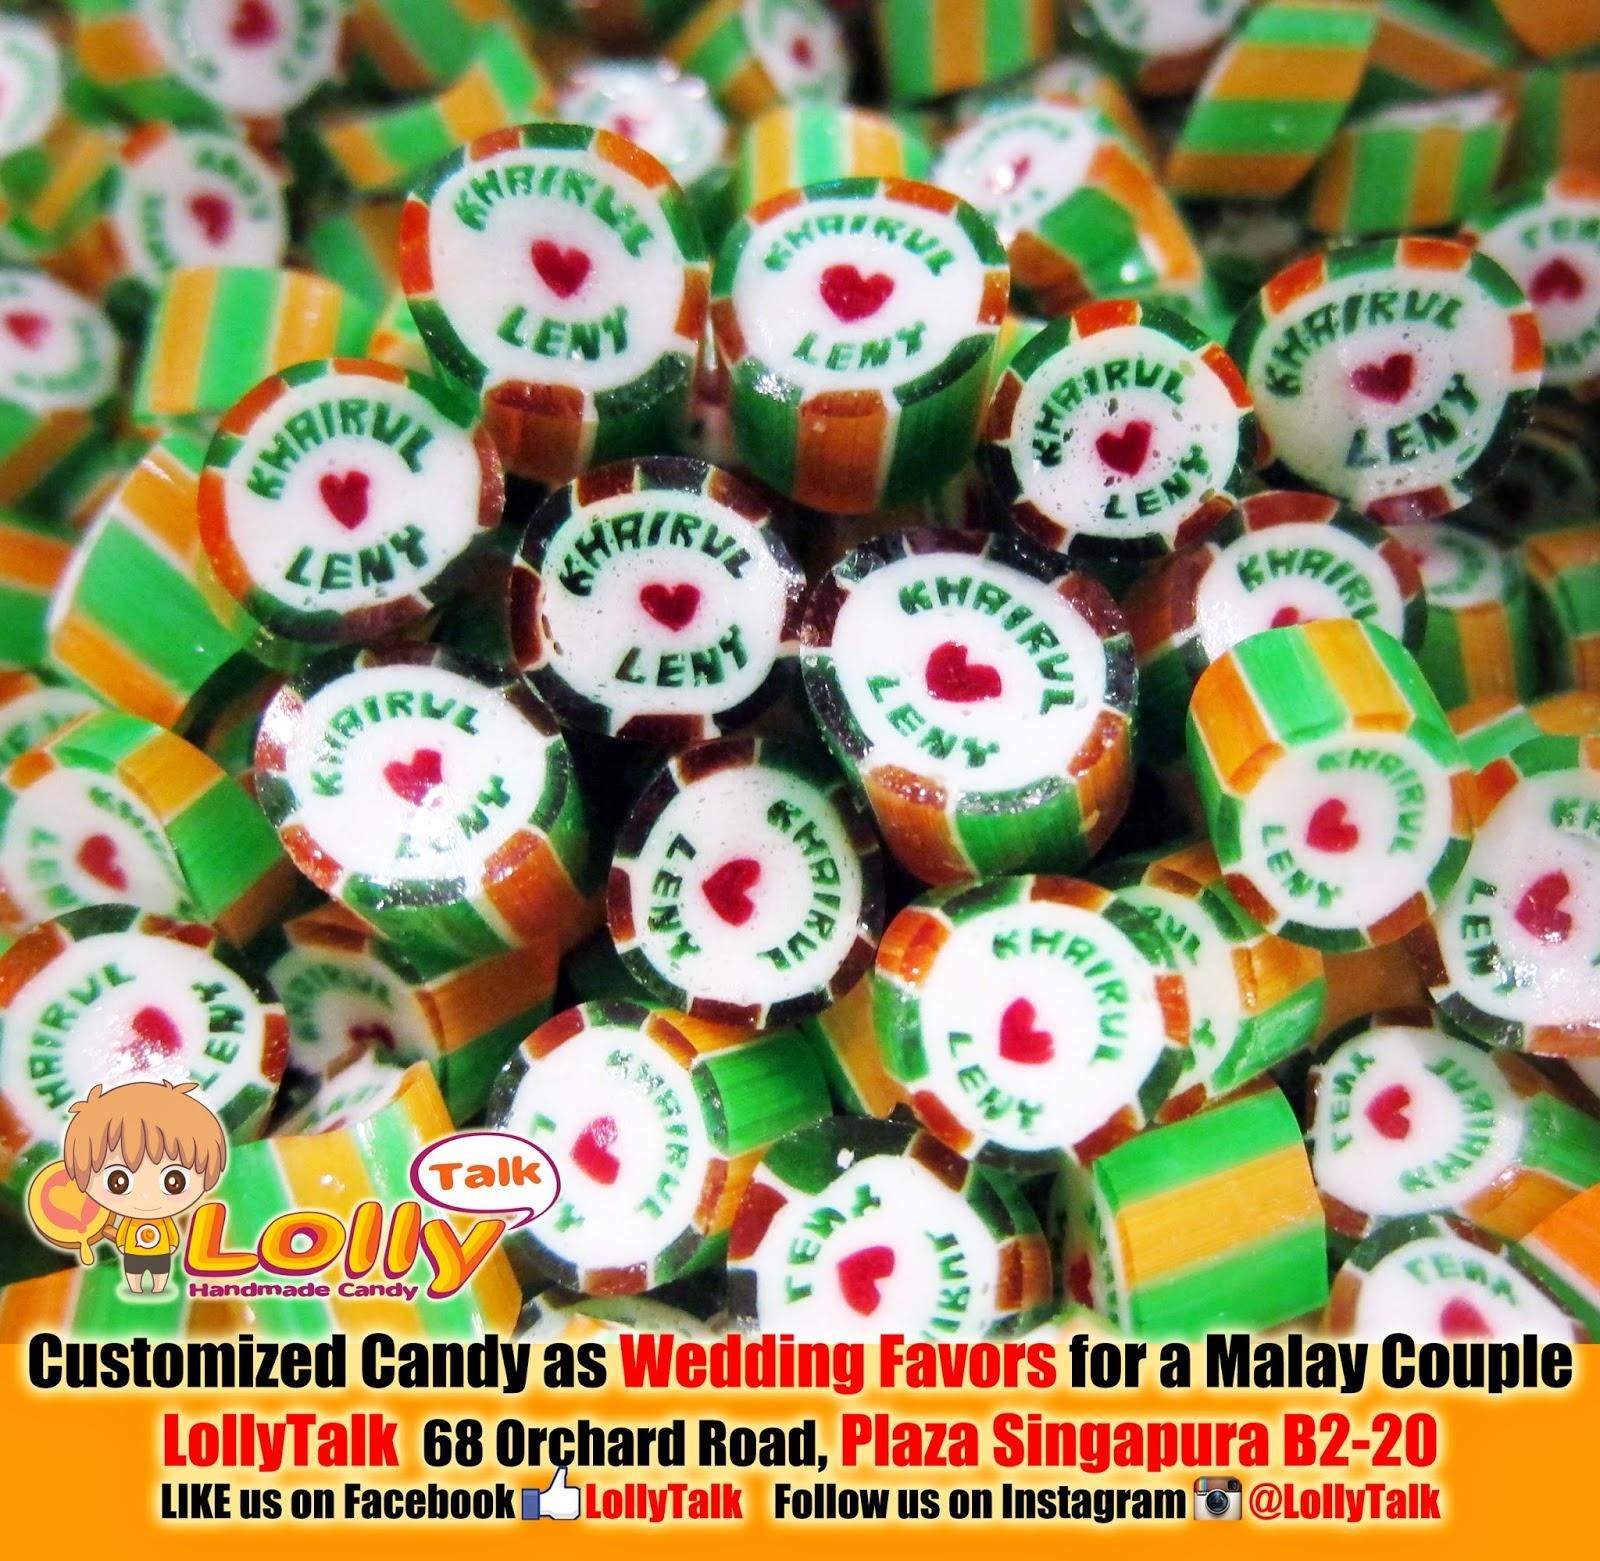 weddings rocks customized handmade rock candy as wedding favors